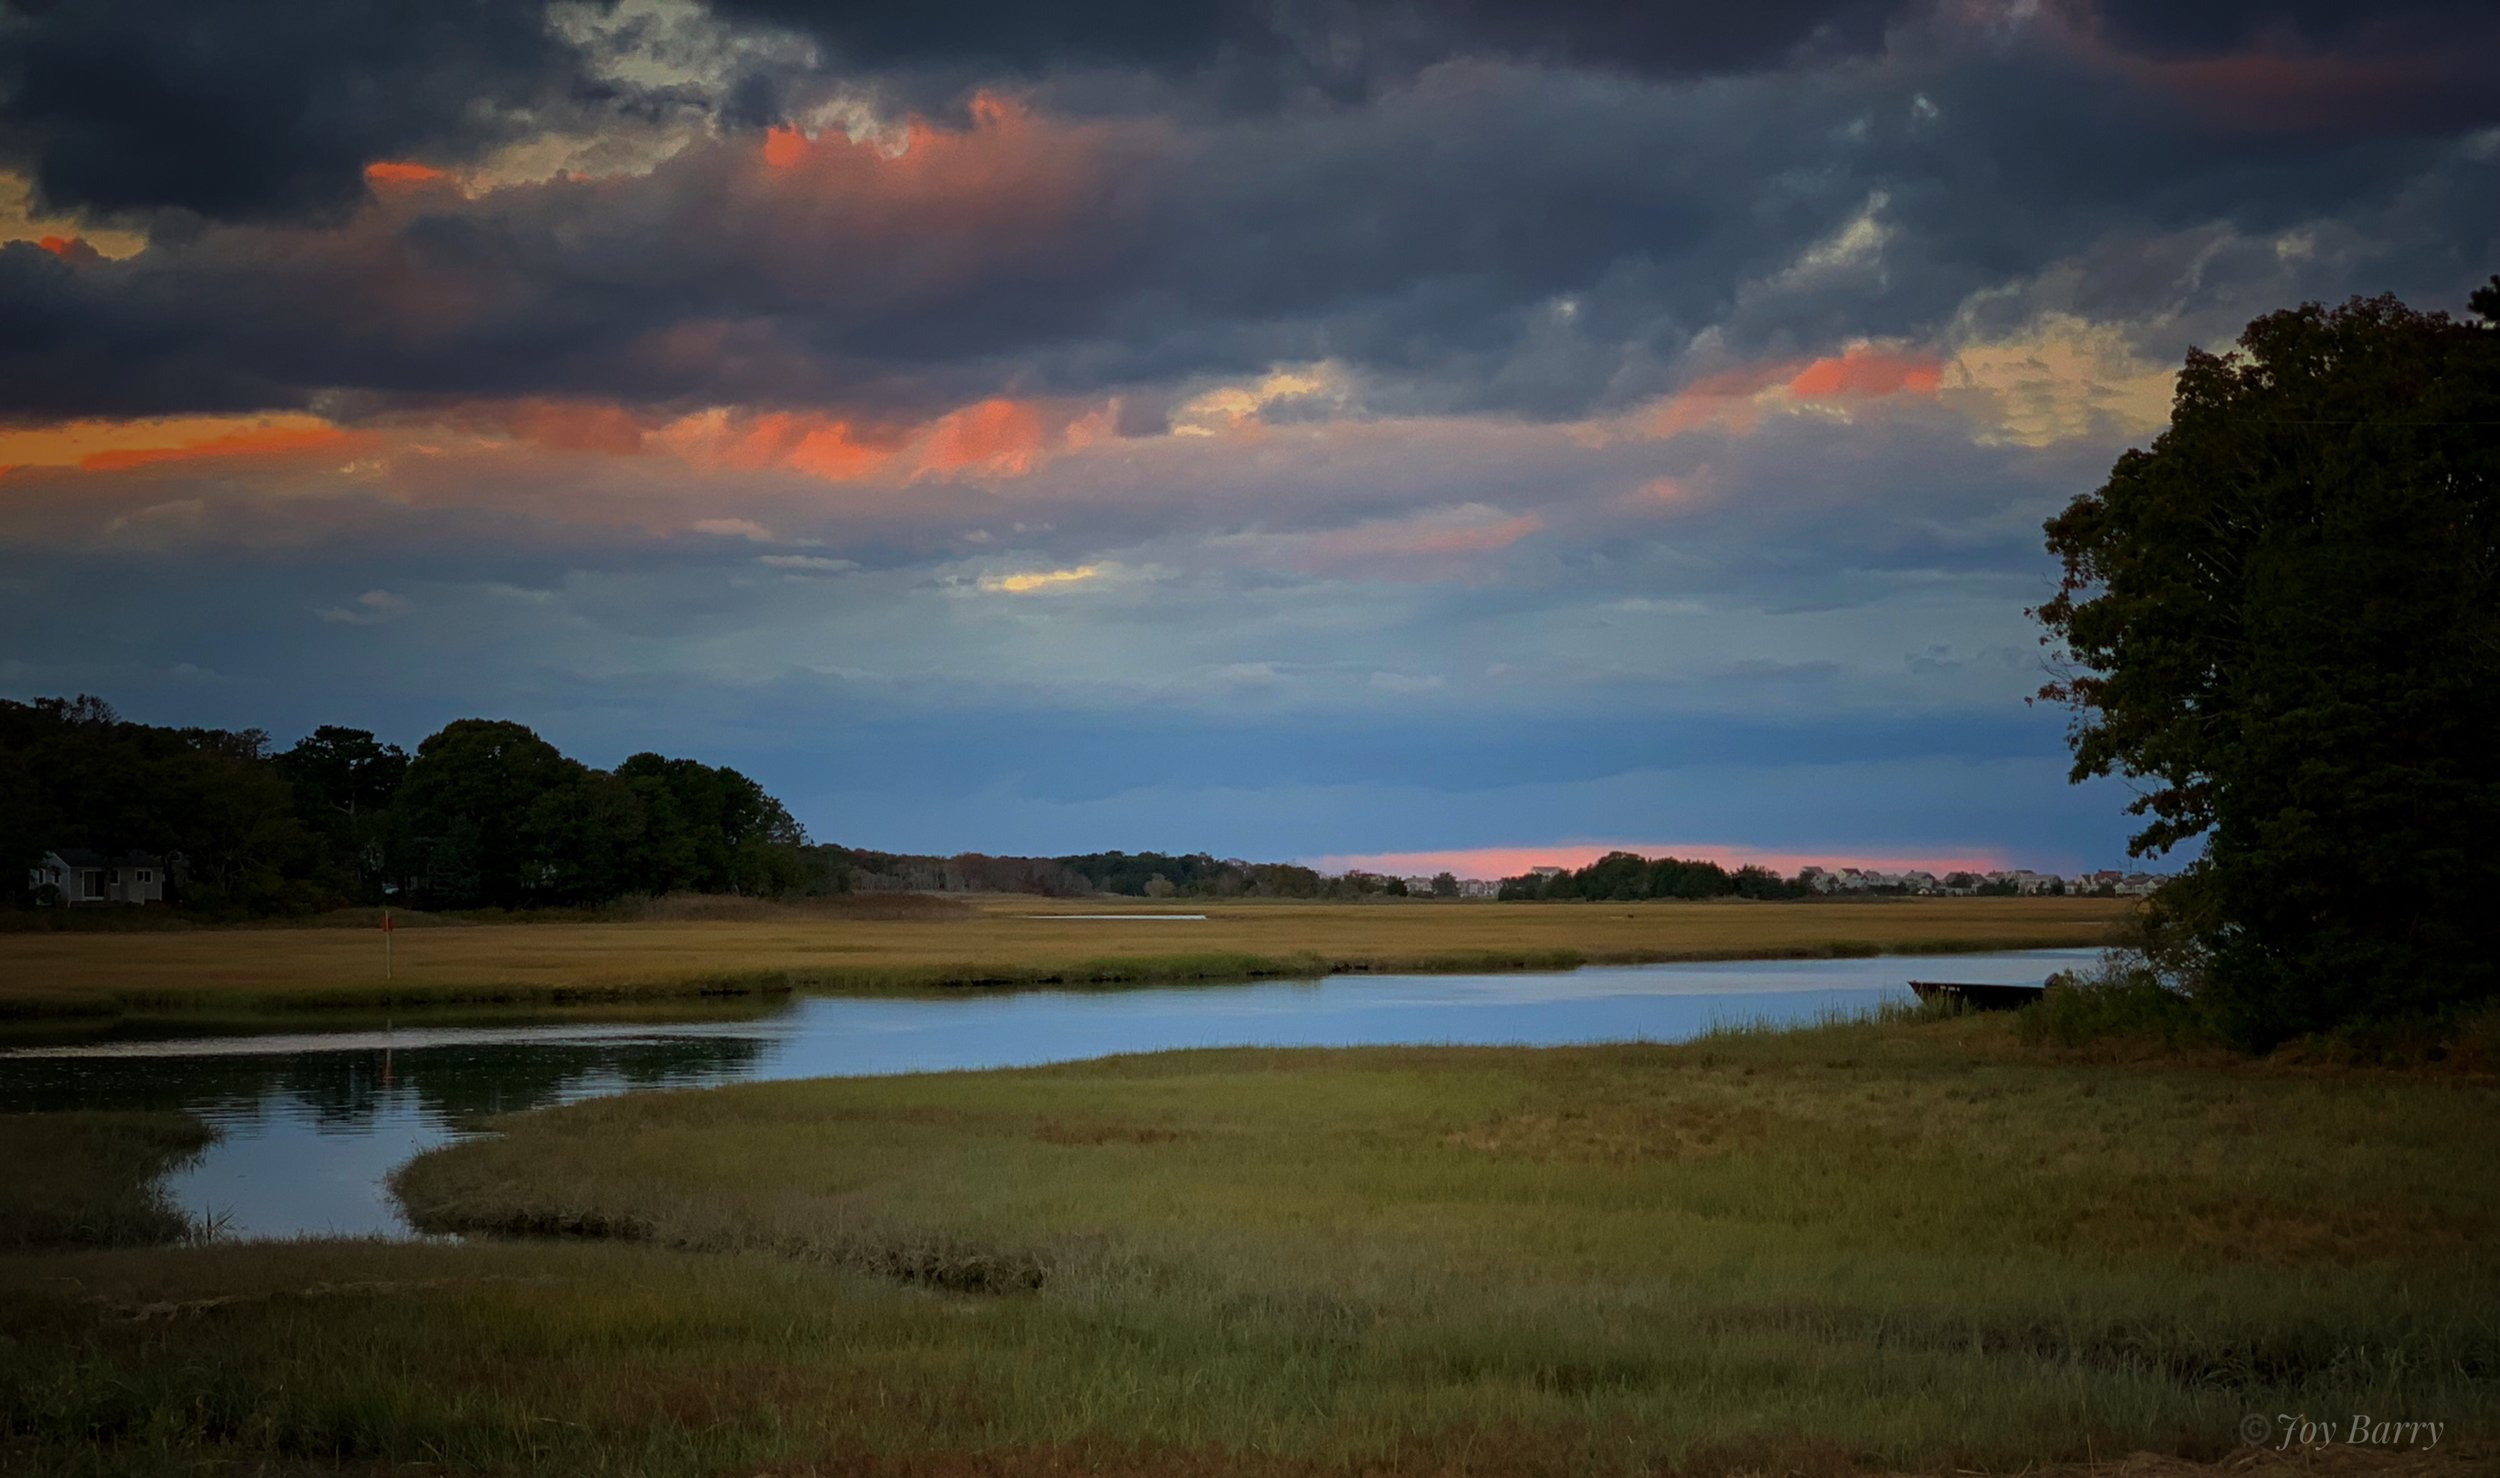 January 13, 2019 - Sunset over Scorton Creek in East Sandwich, Massachusetts.